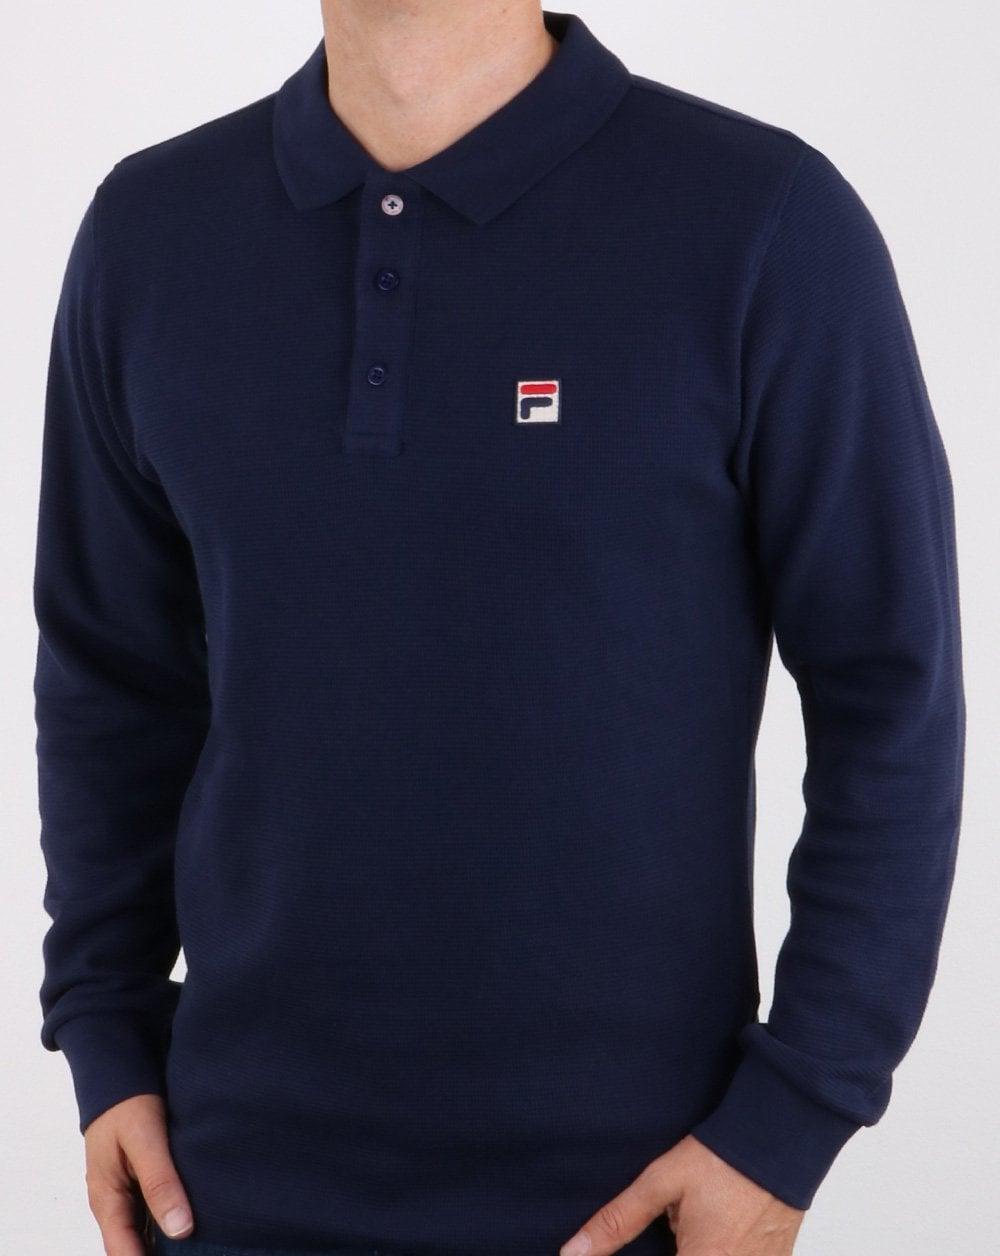 448752b6ba054 Fila Vintage Long Sleeve Polo Shirt Navy, Mens, Polo, Cotton, Smart